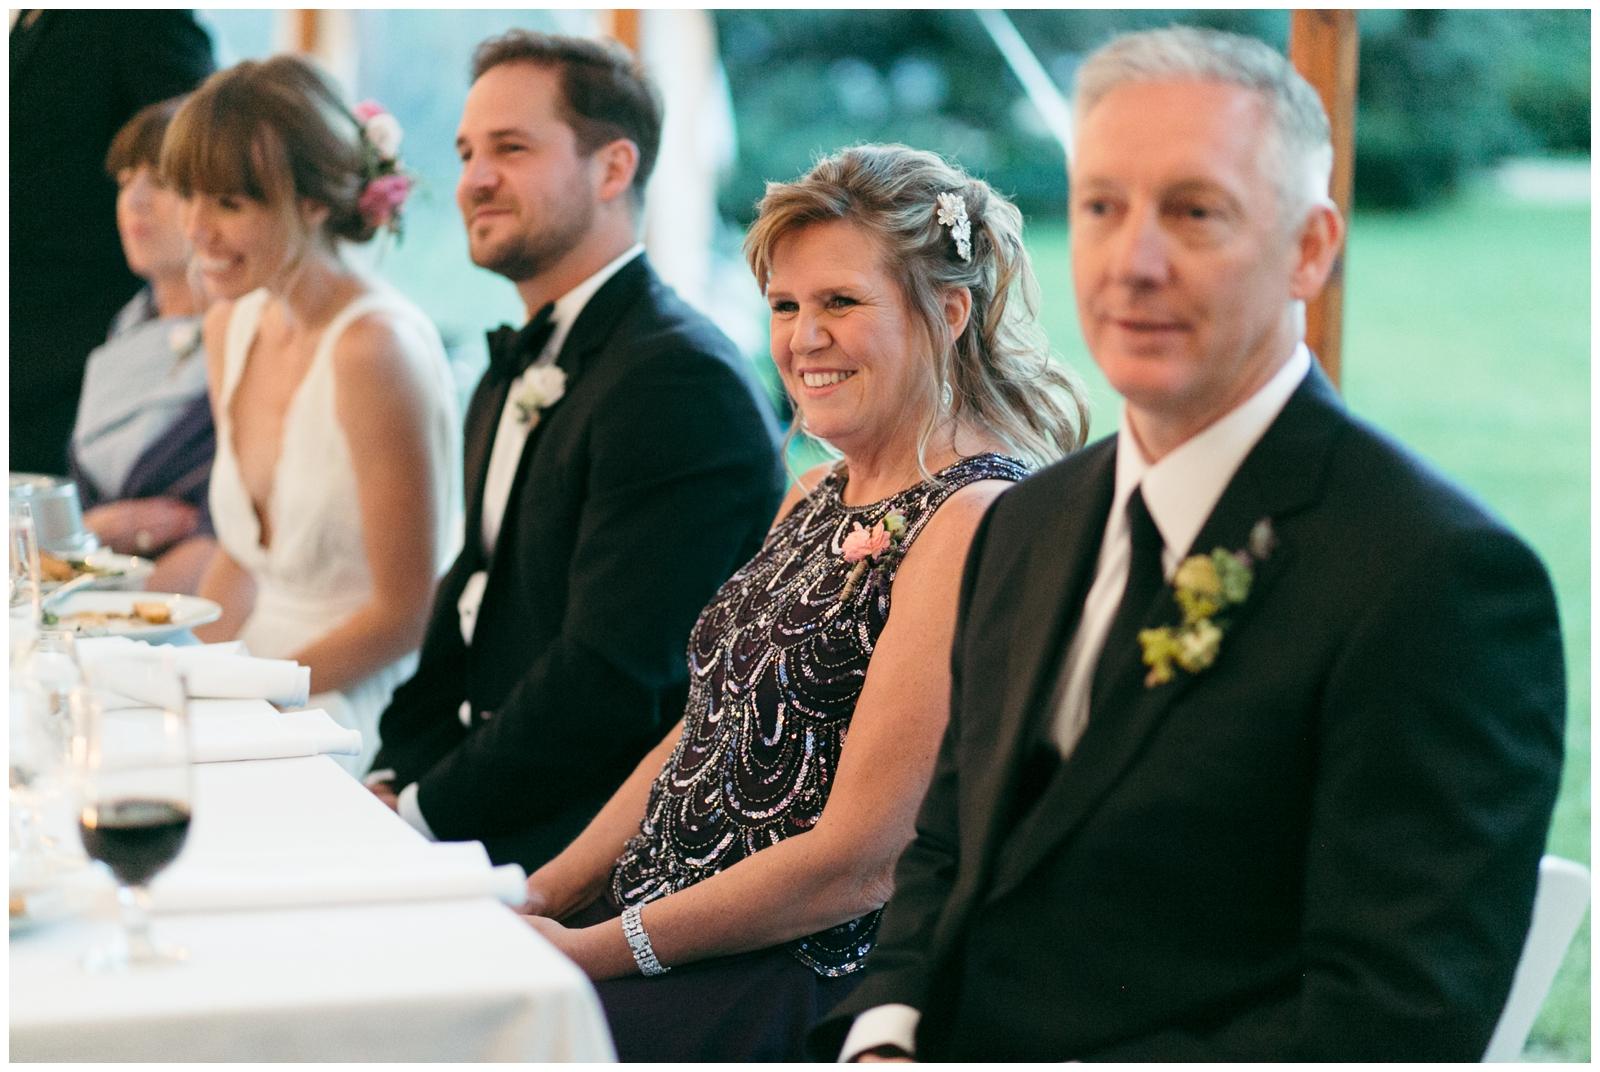 Moraine-Farm-wedding-Bailey-Q-Photo-Massachusetts-wedding-photpgrapher-131.jpg